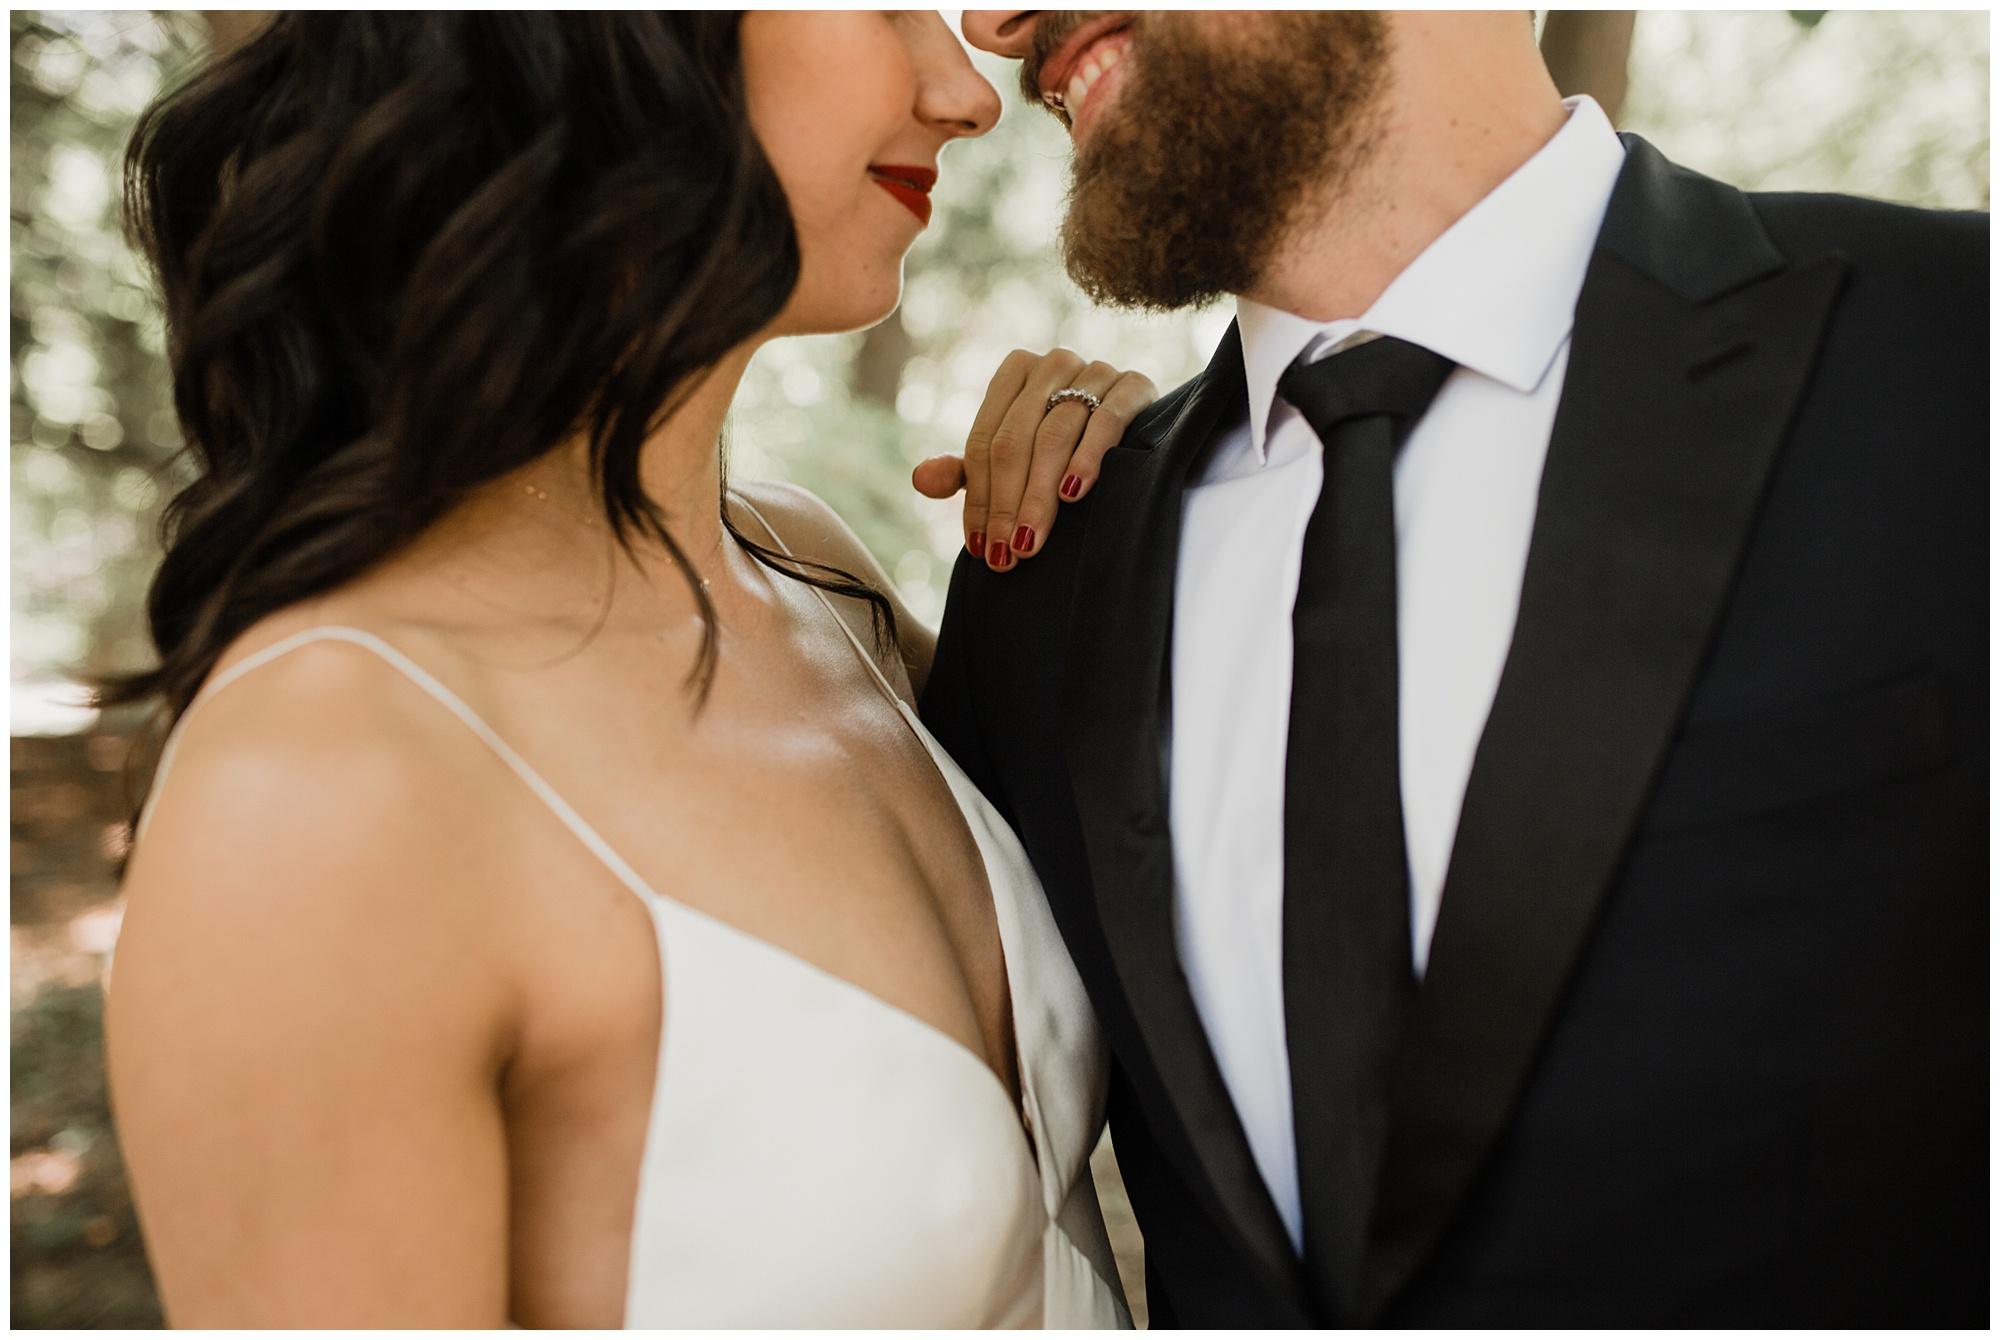 allerton_park_wedding_champaign_il_chicago_wright_photographs_ne_0054.jpg